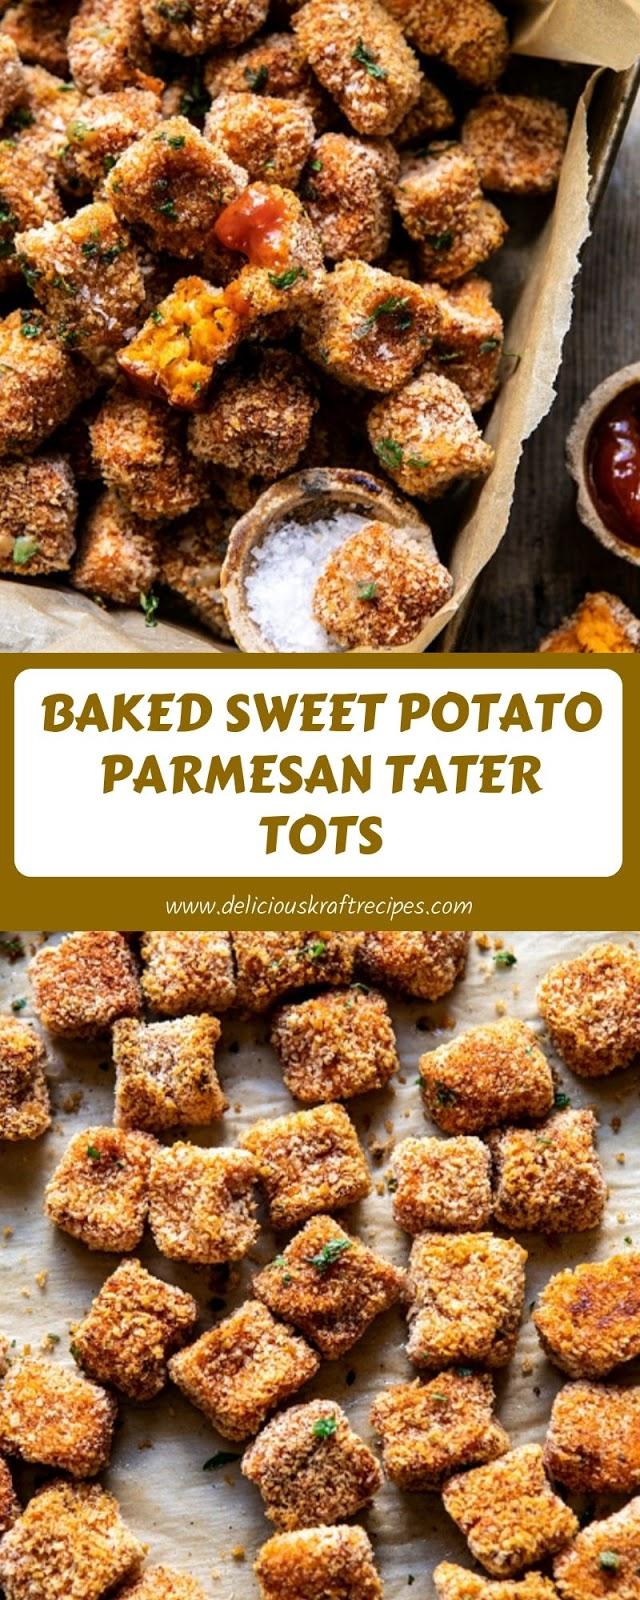 BAKED SWEET POTATO PARMESAN TATER TOTS